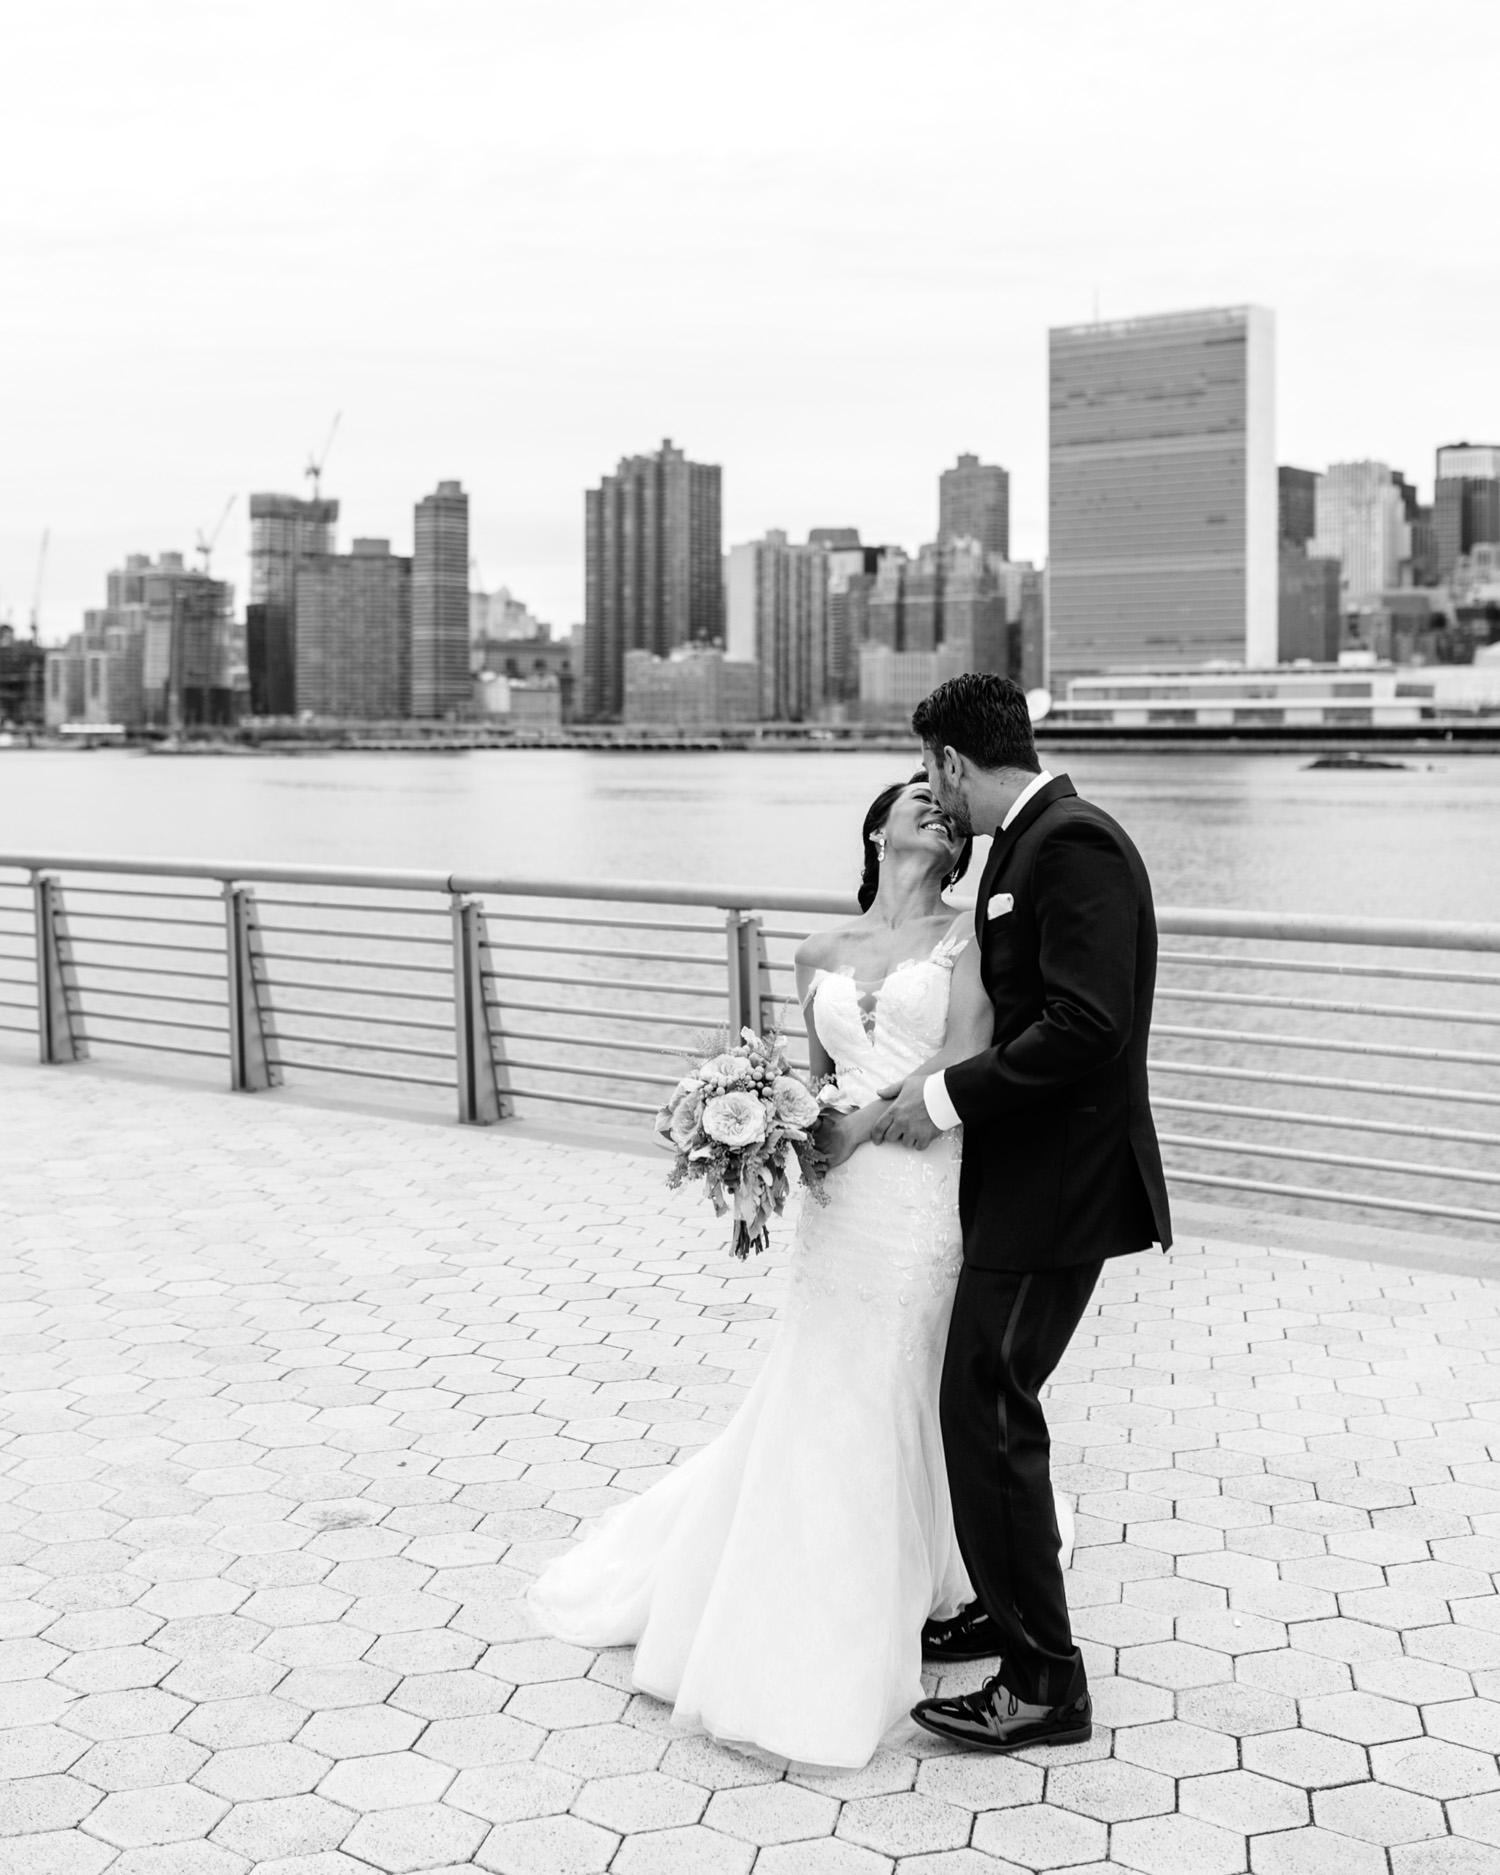 Metropolitan Building Wedding Queens, NY - Jessica & Tony x The Gathering Season 035.jpg